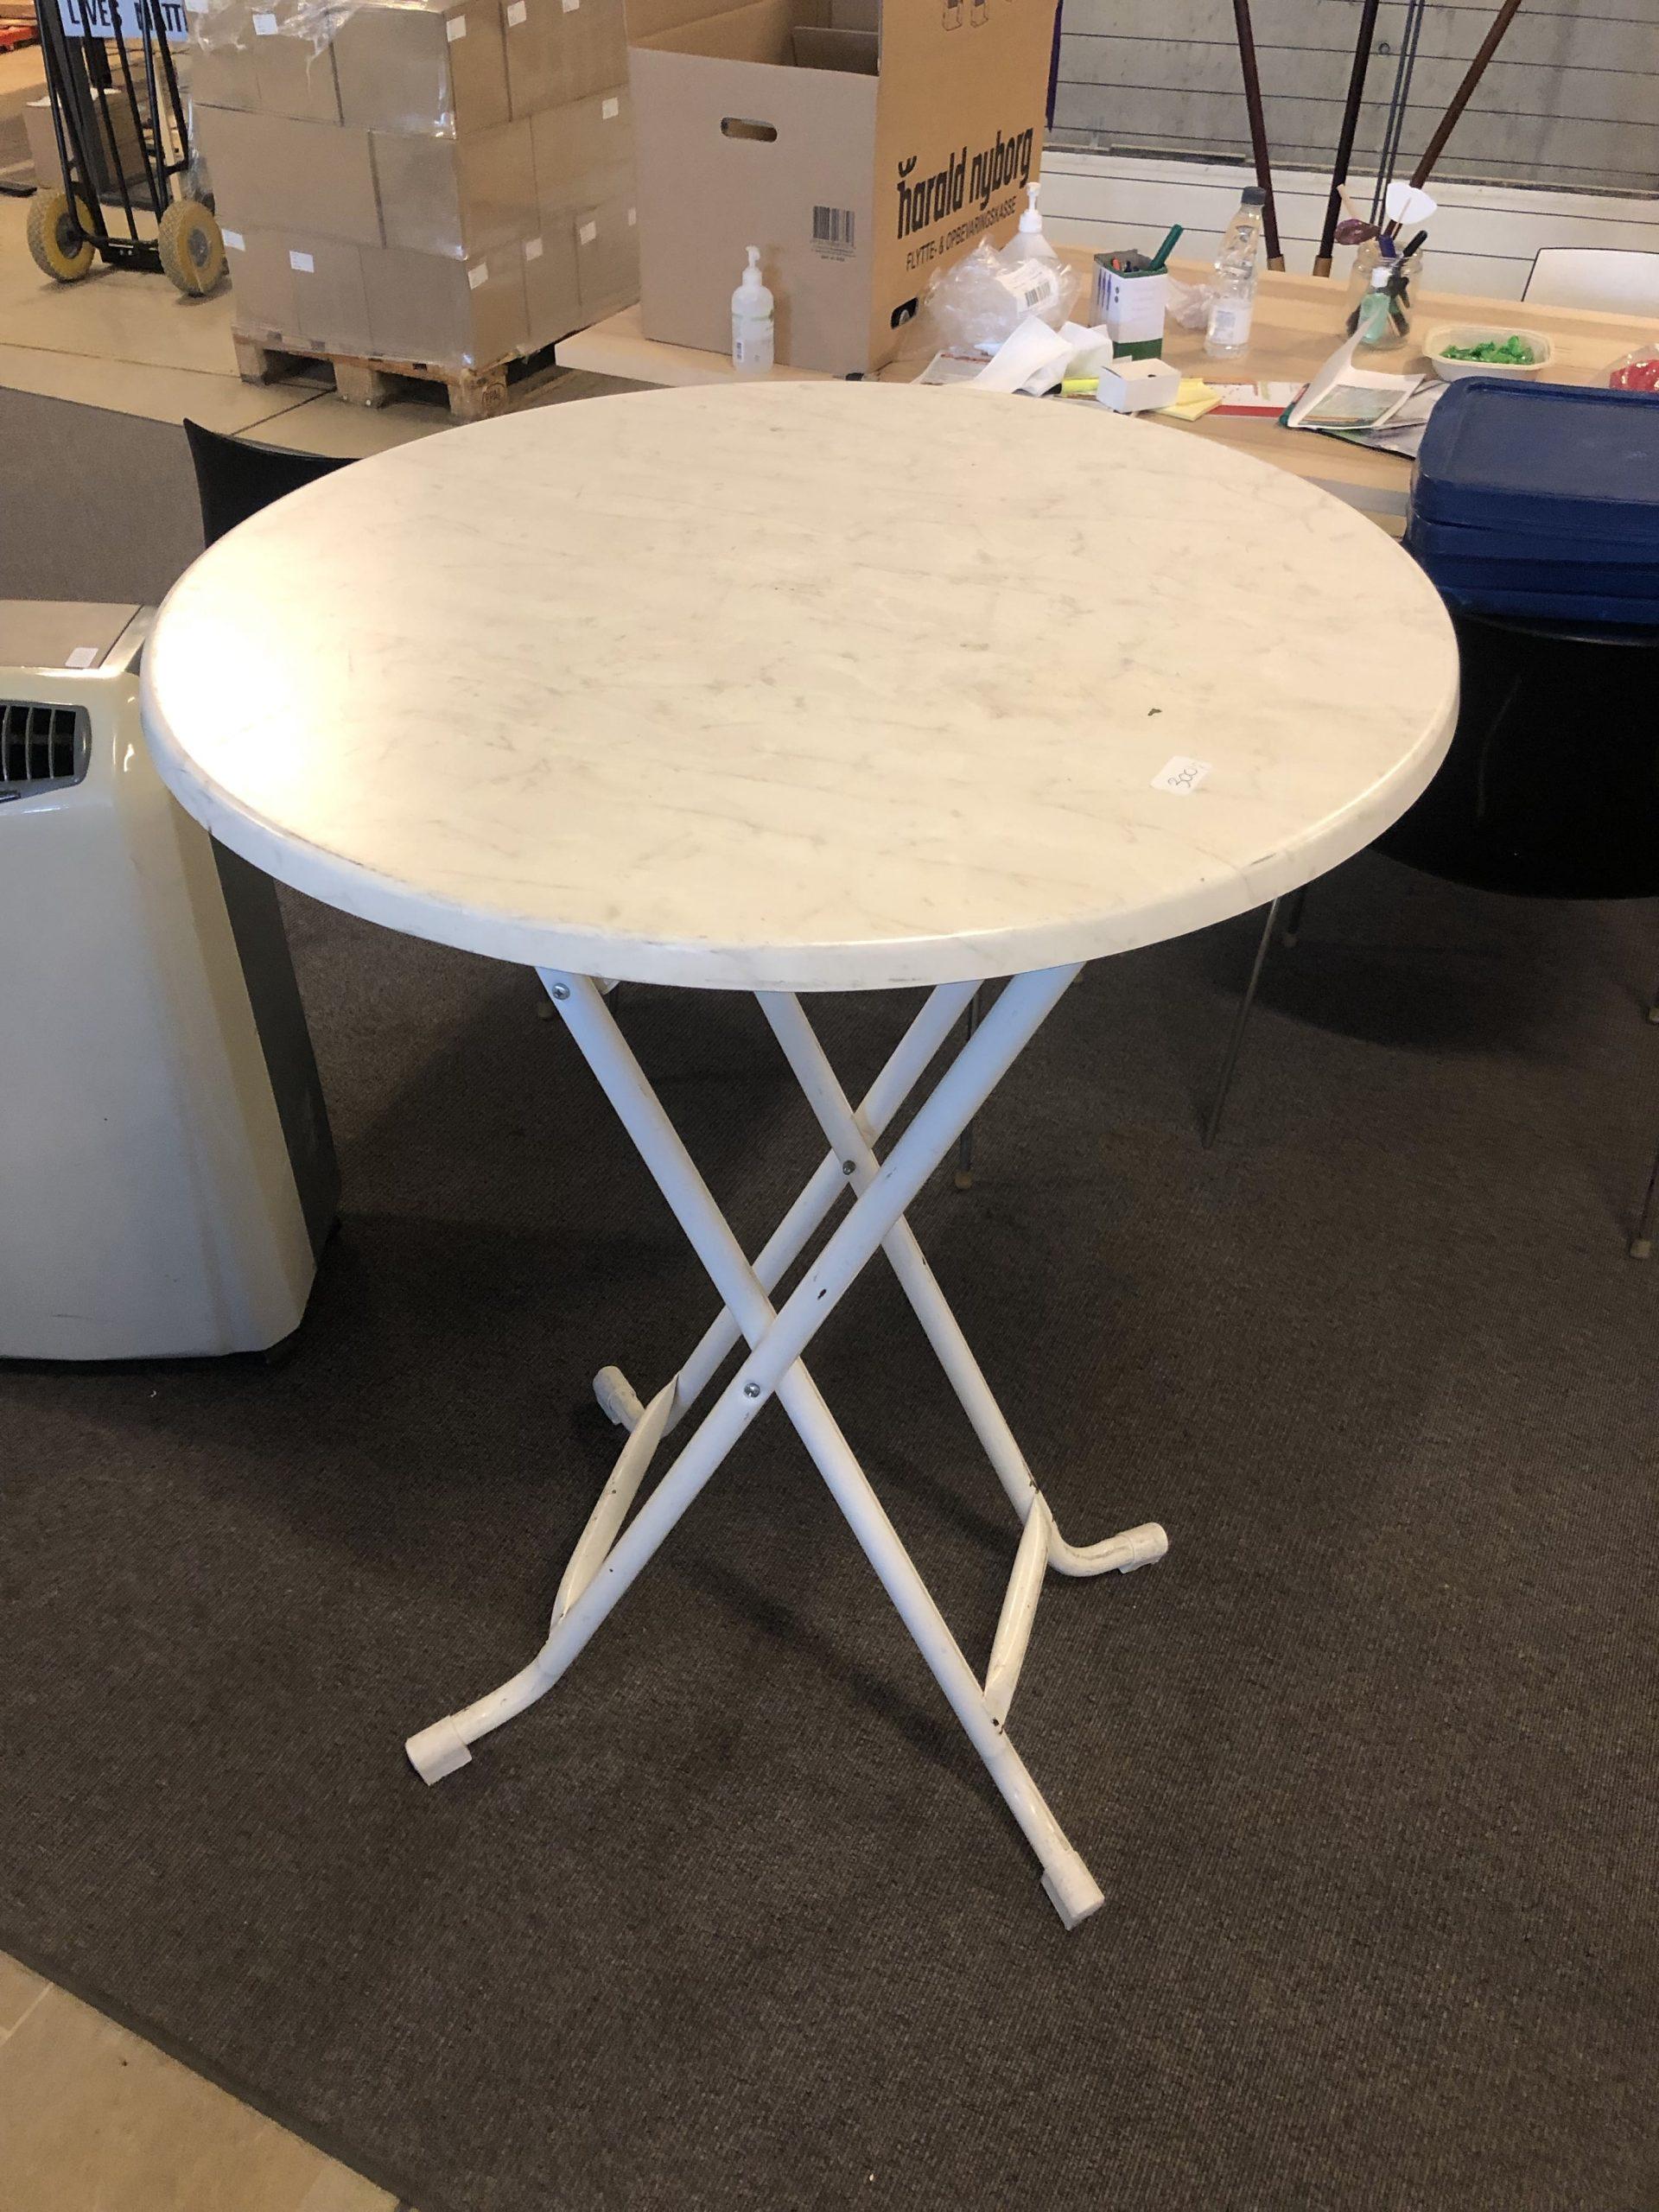 High folding table, white